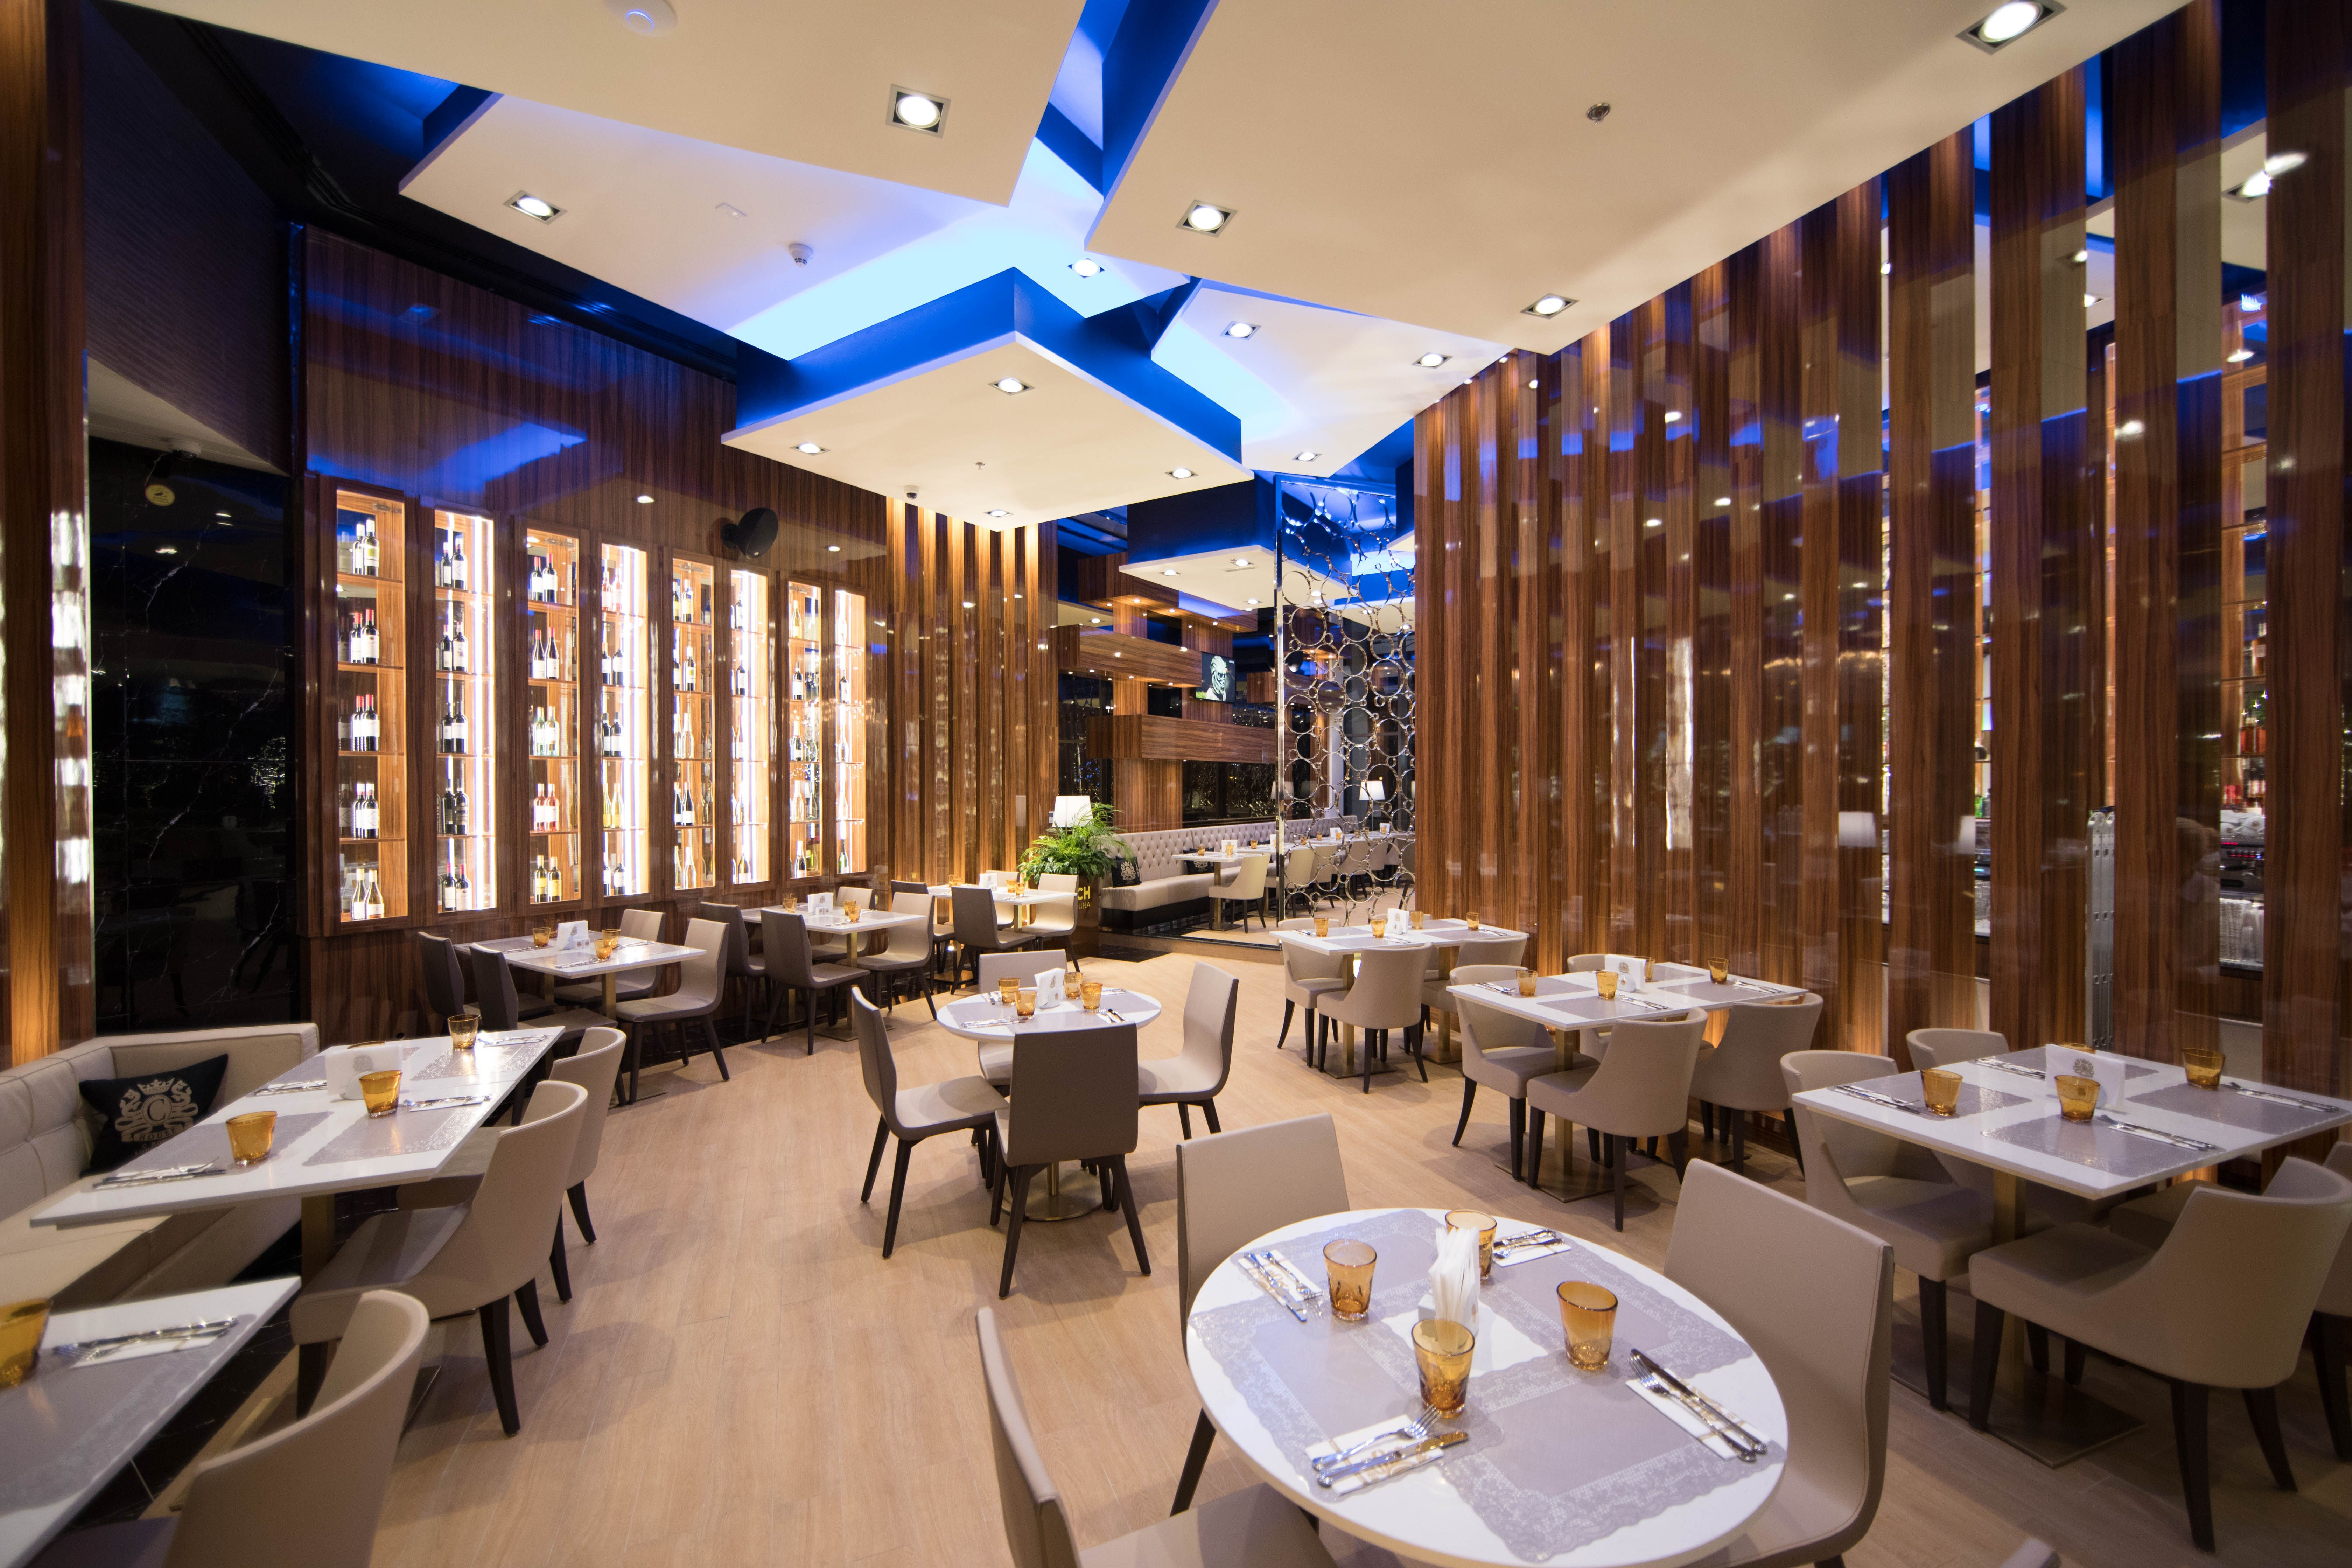 C HOUSE - Dubai - Picture gallery | rESTAURACJA---rESTAURANT ...